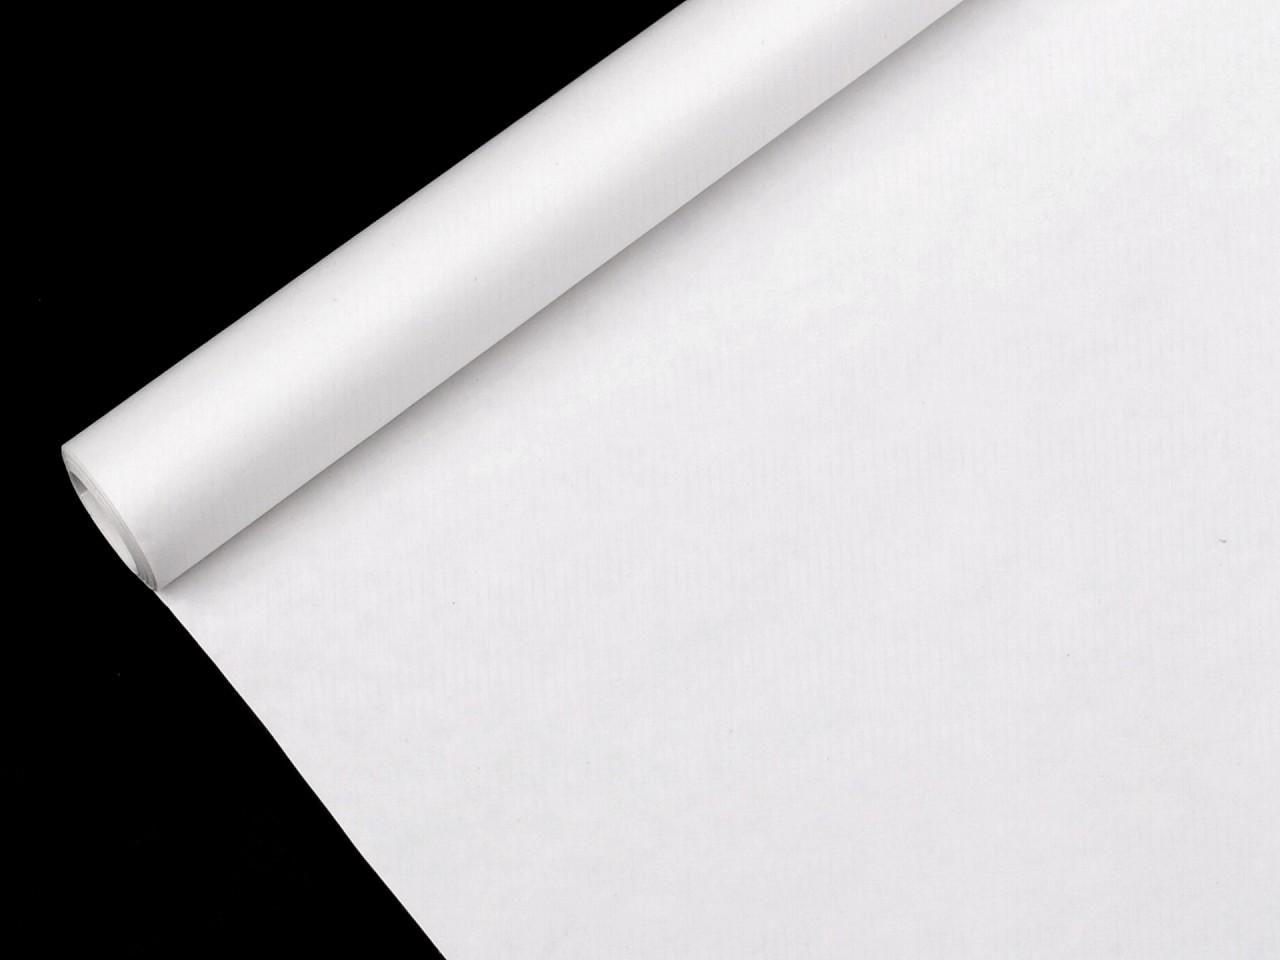 Balicí papír 0,9x5 m 1 ks